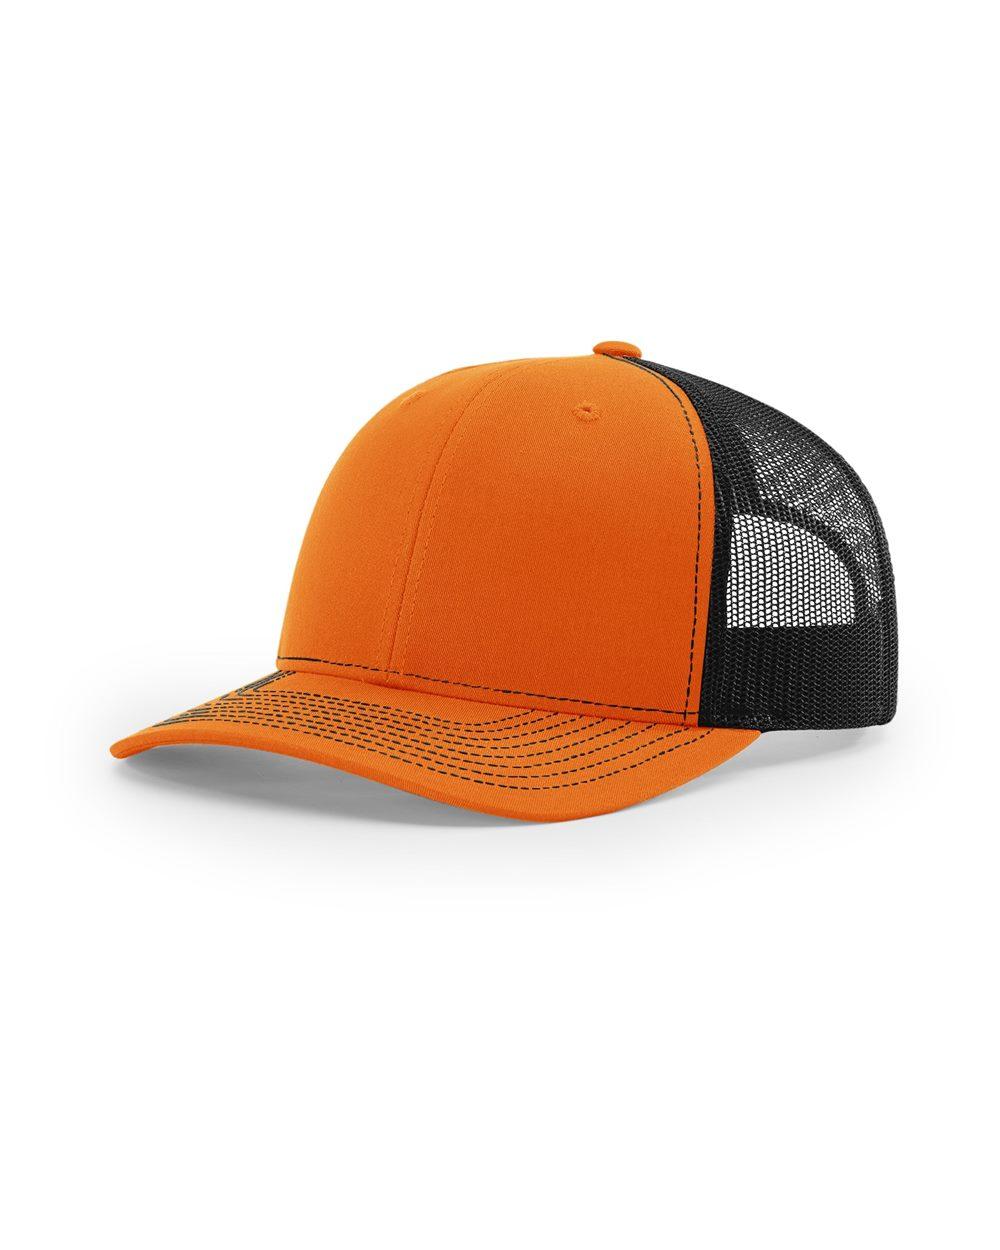 click to view Orange/ Black